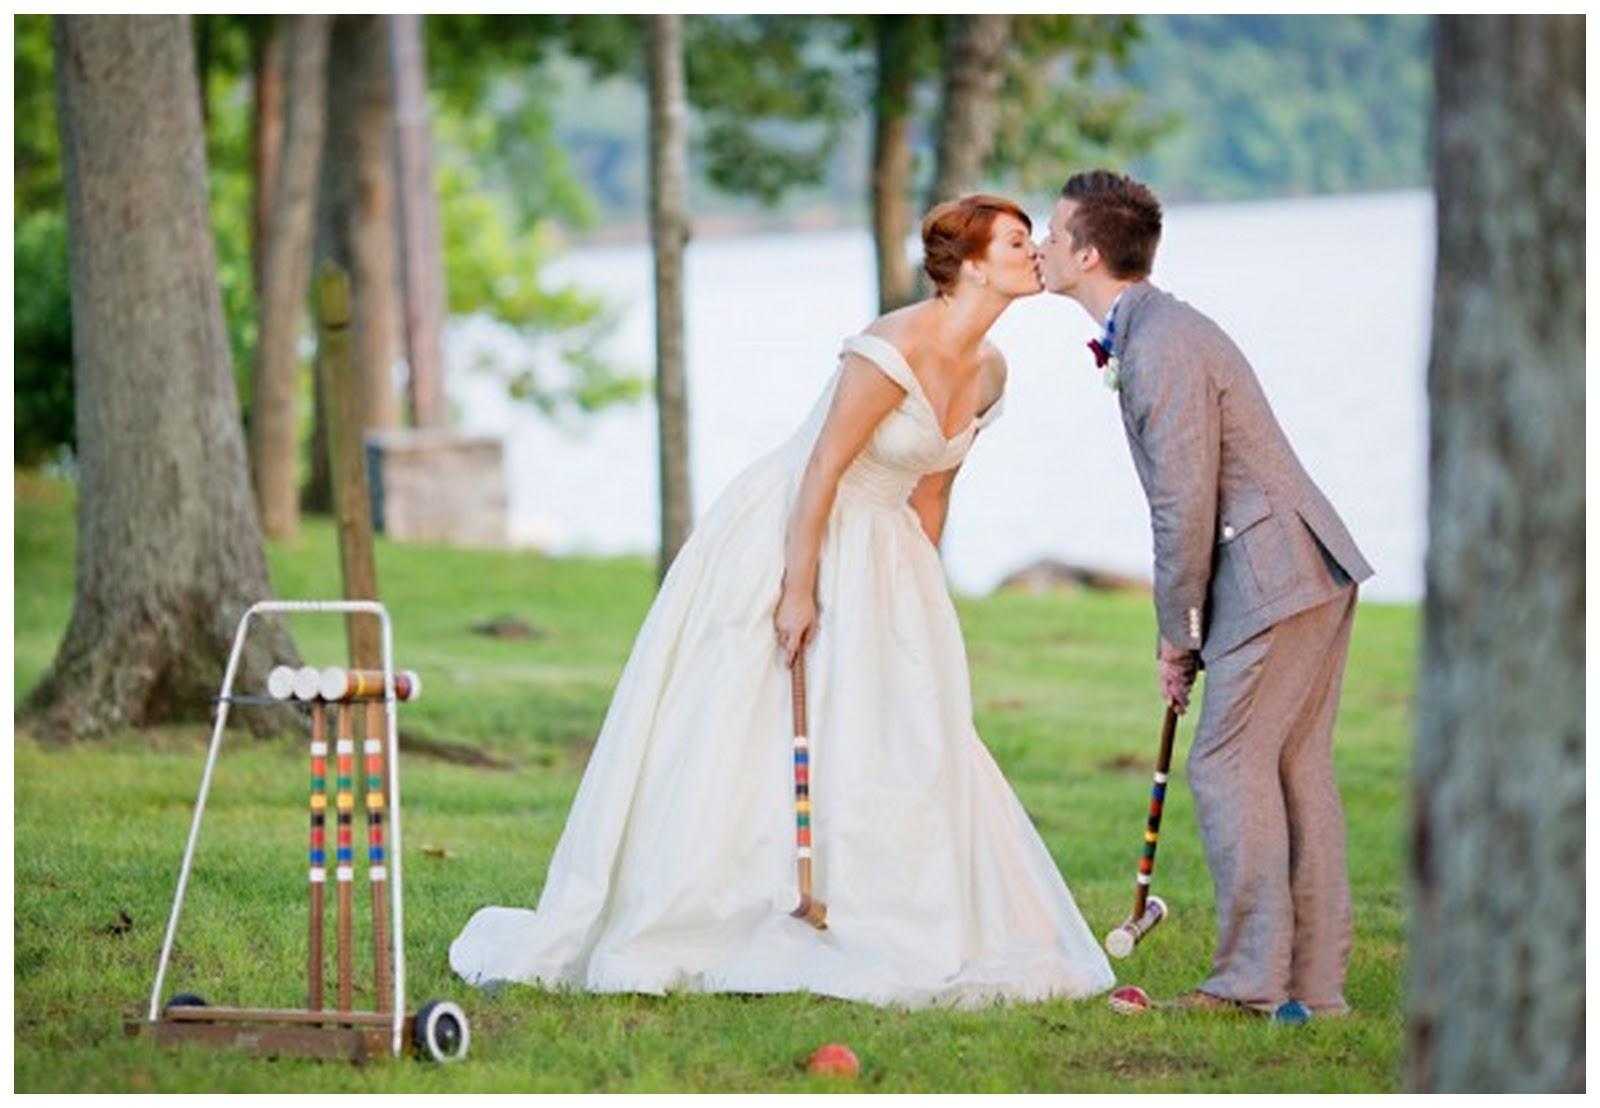 Fun Wedding Lawn Games